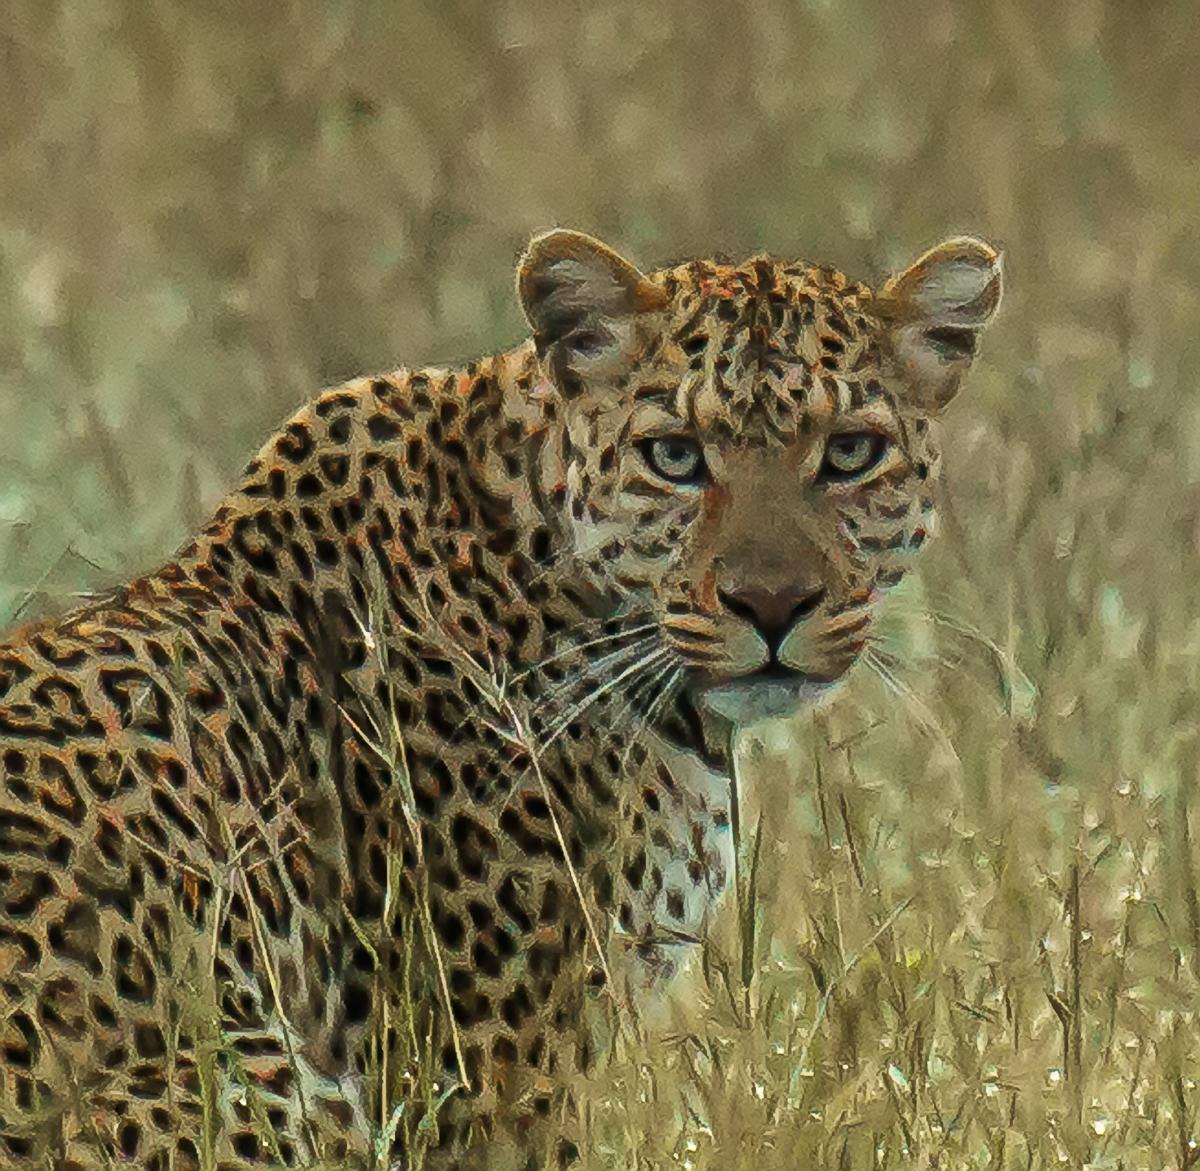 Africa-6178-Edit-Edit.jpg